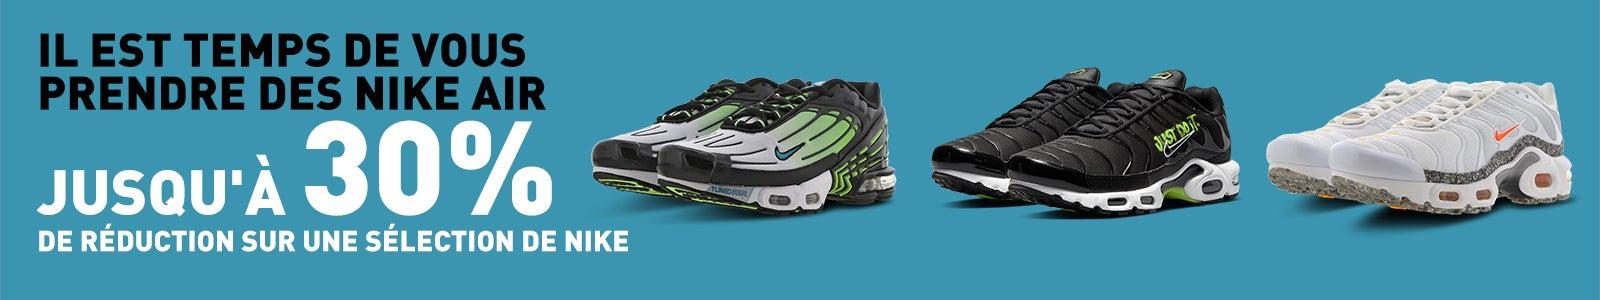 Nike Promo | Foot Locker France